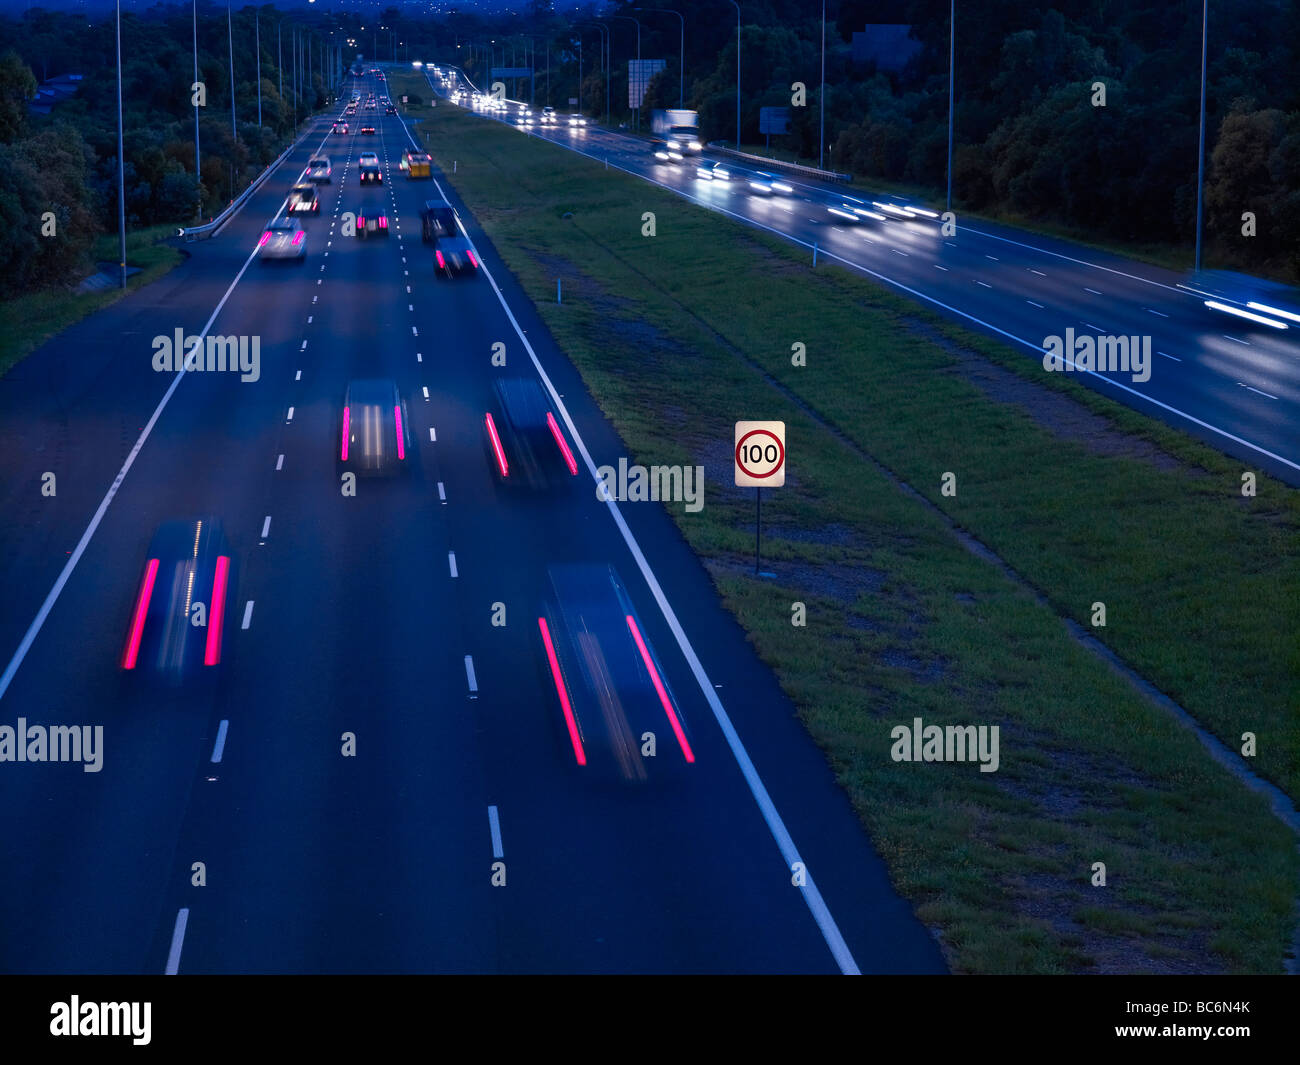 Nacht Verkehr M1 Autobahn Brisbane Australien Stockbild